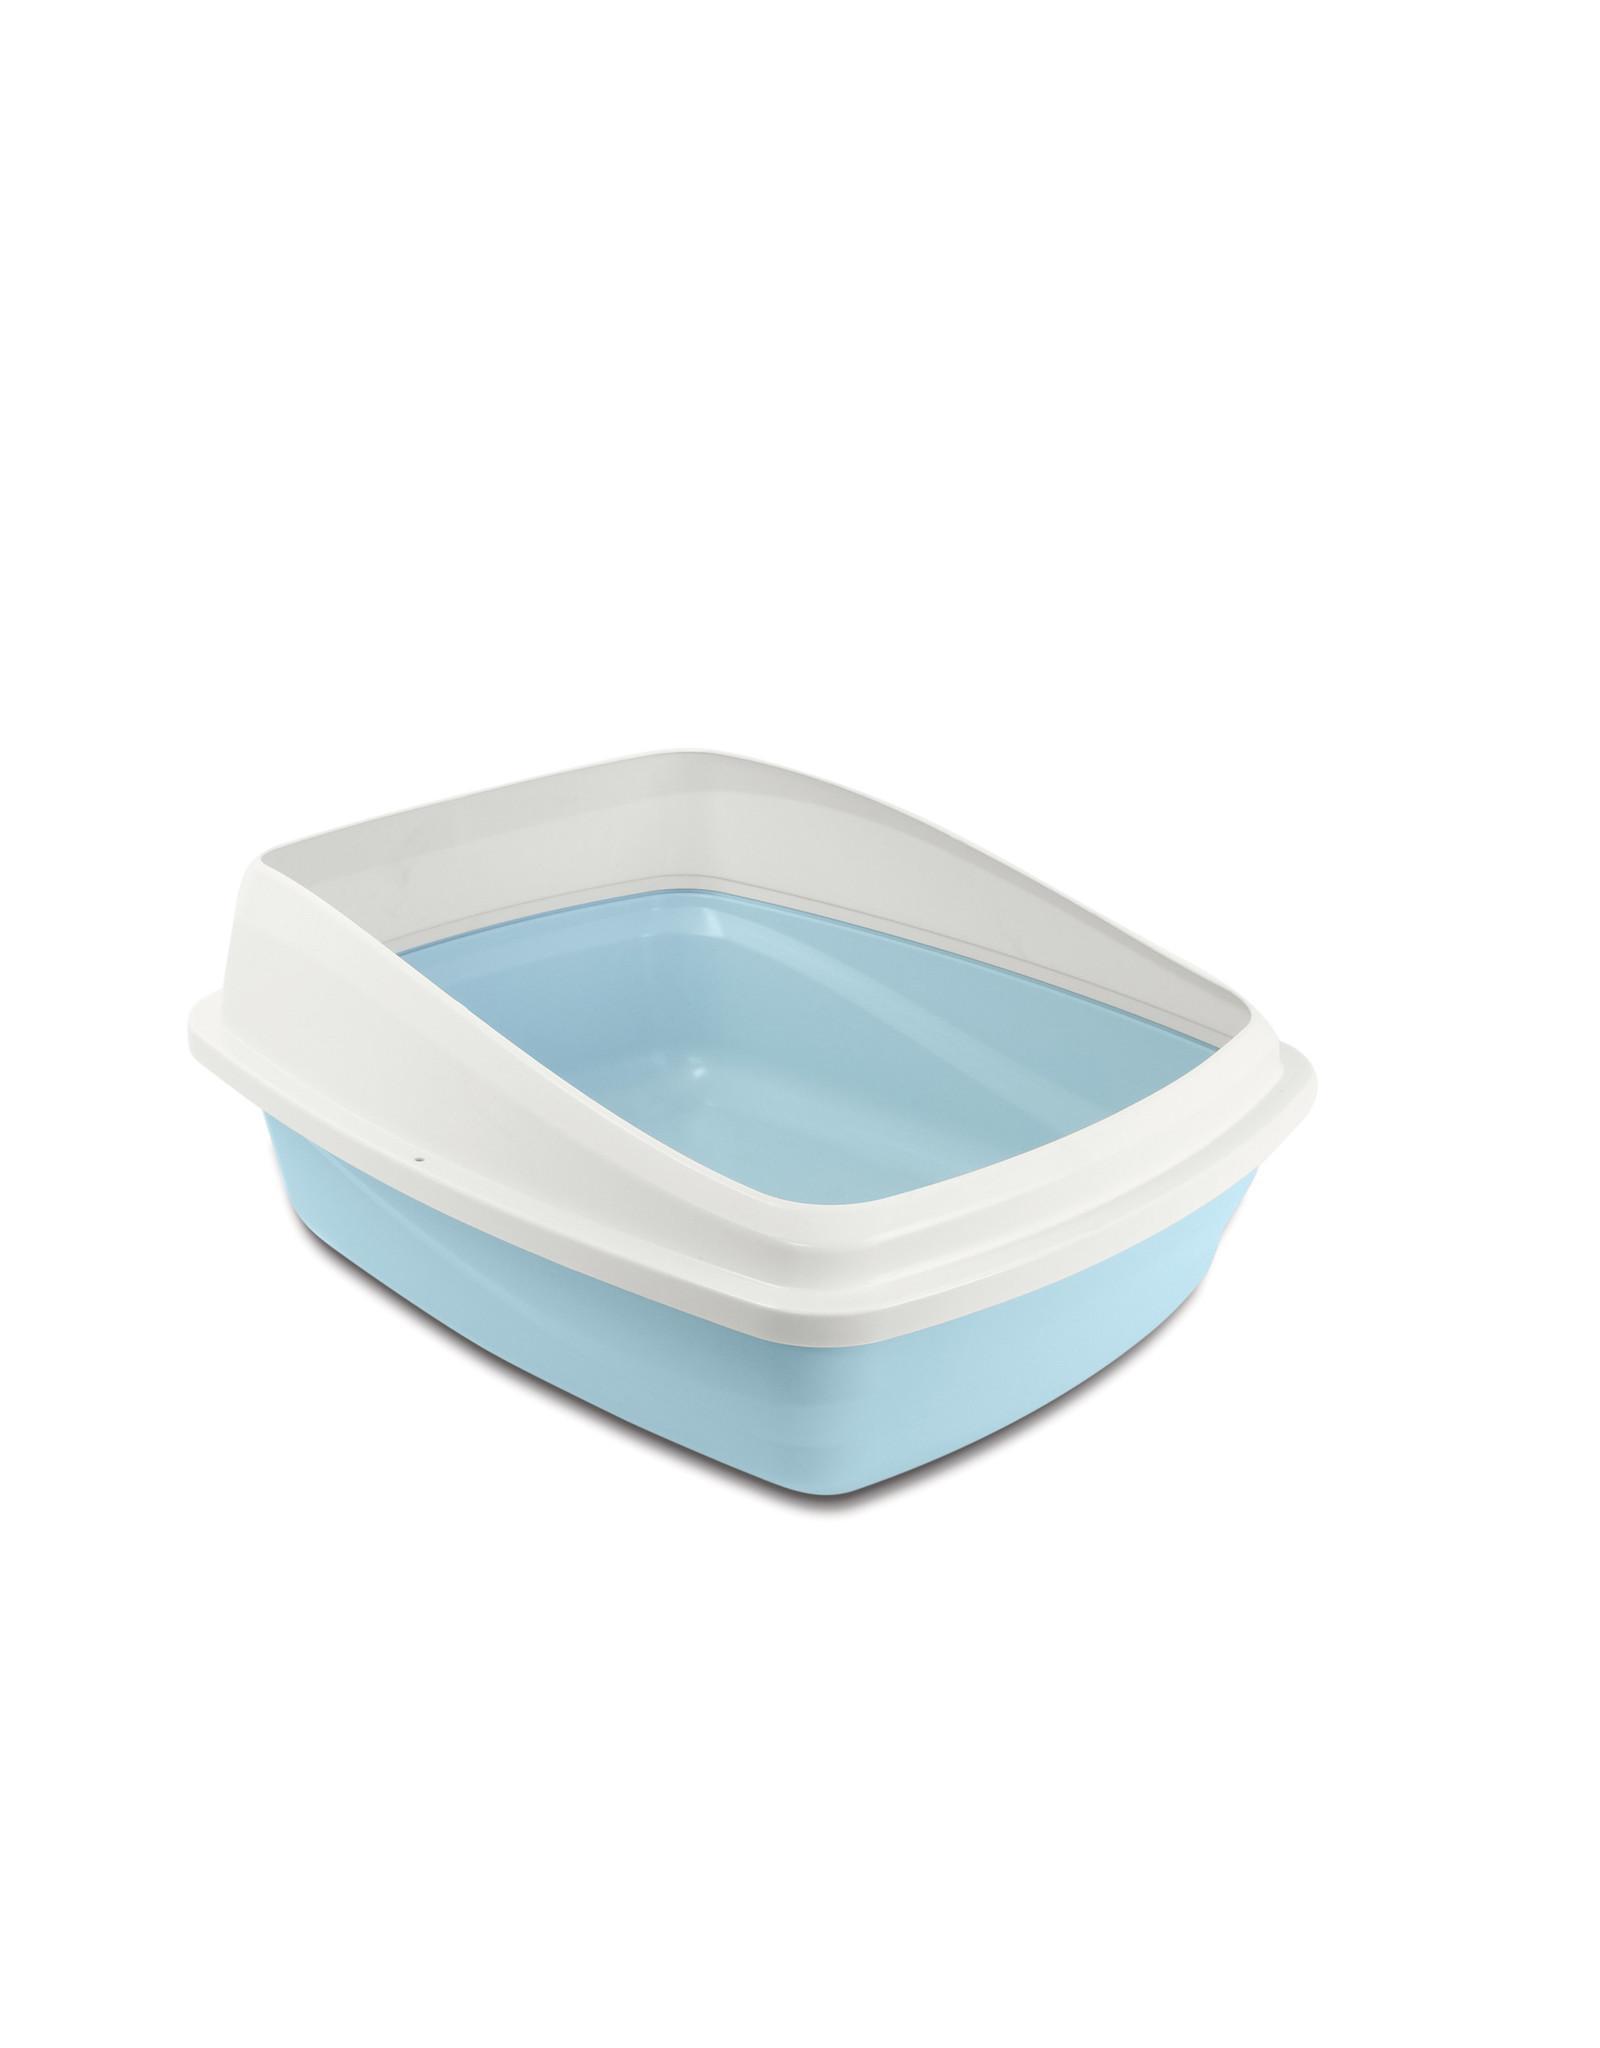 CatIt Cat Pan with Removable Rim Medium Blue/Grey